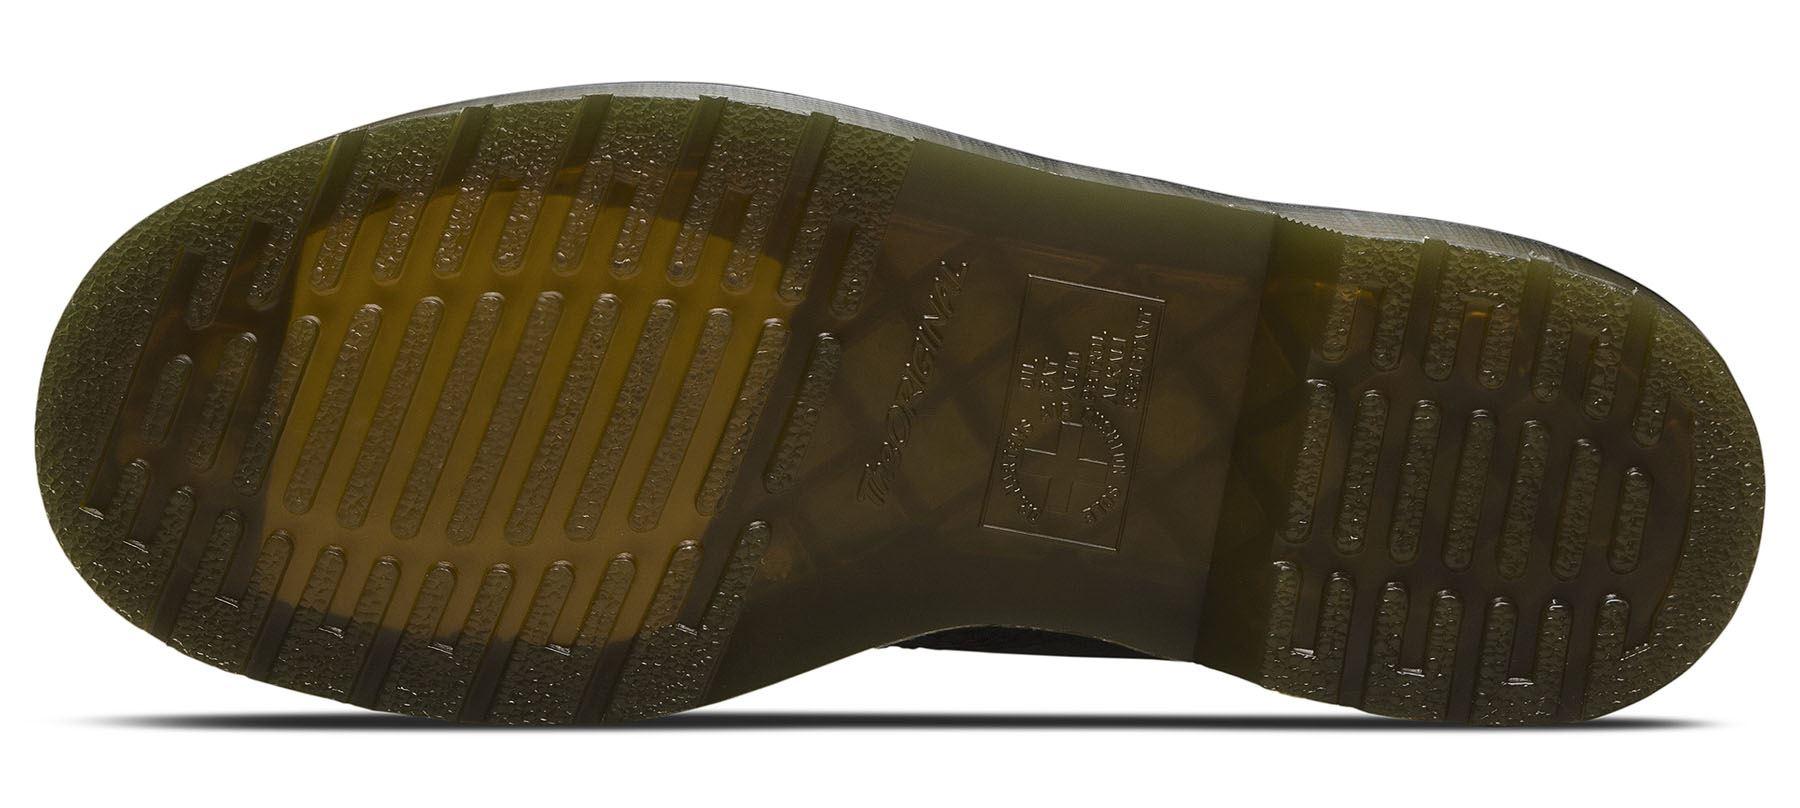 Dr Martens Pascal Antique Antique Antique Temperley Leather 1460 Leather Ankle 8 Eye Boots ea1335